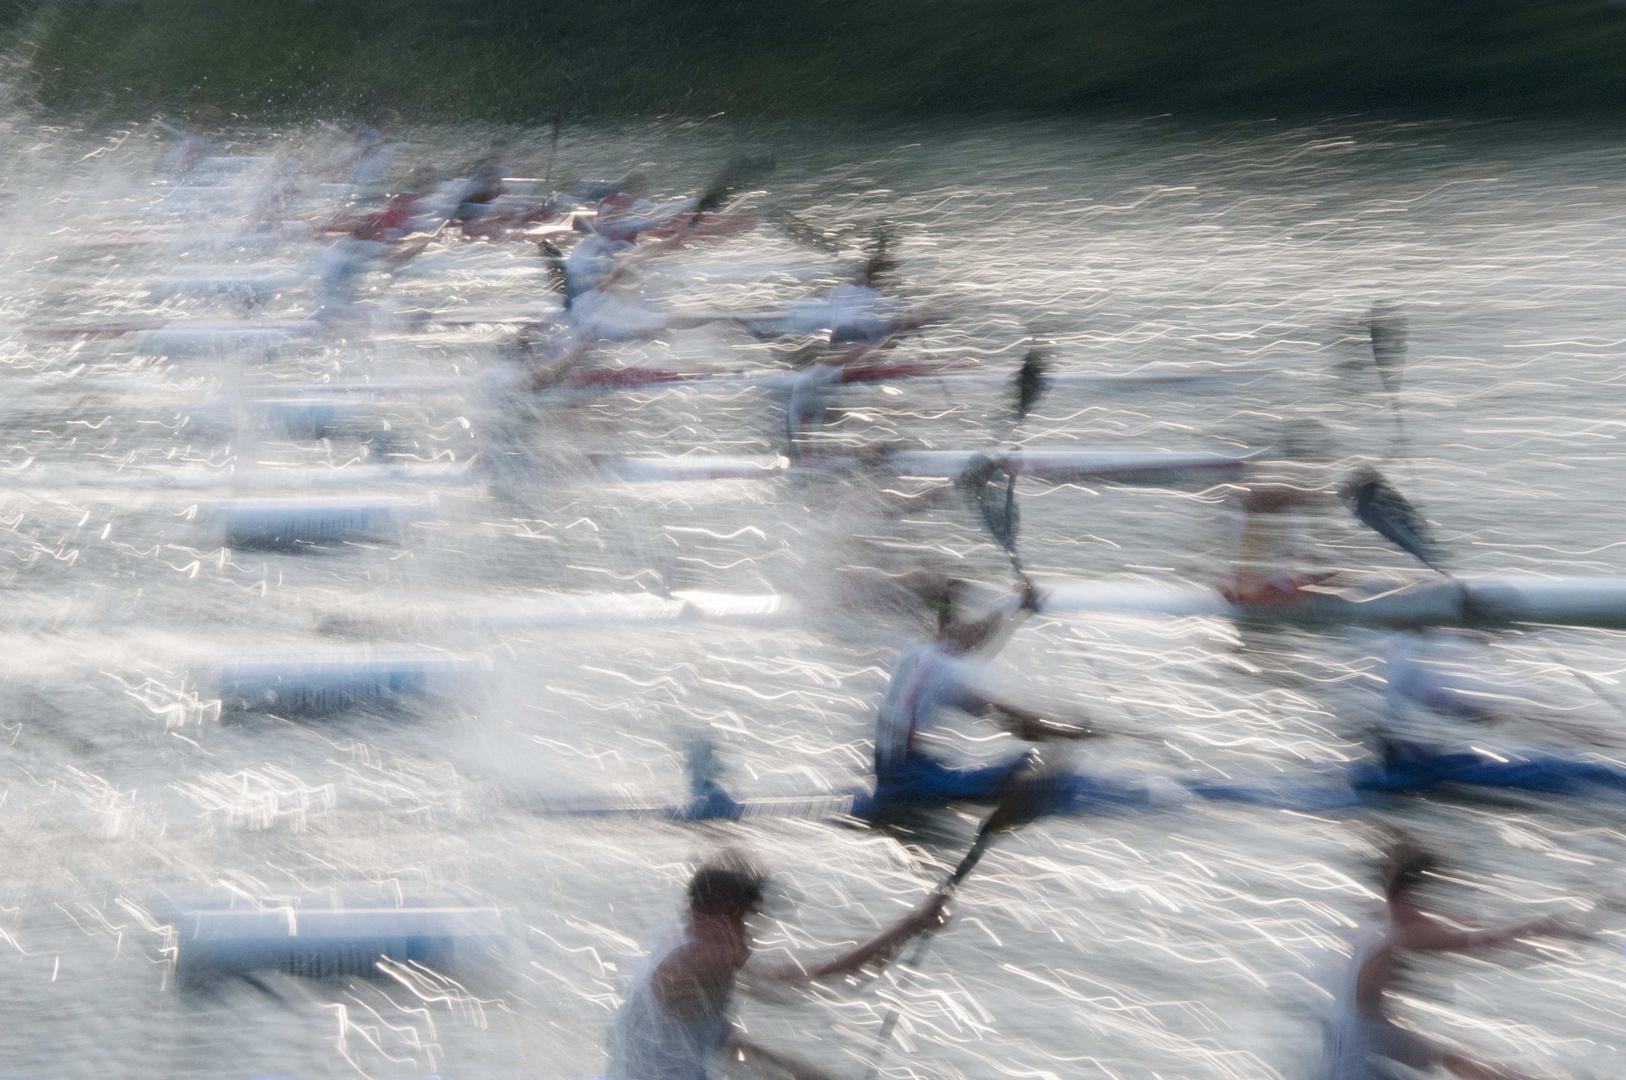 Kanu WM / Canoe WC Duisburg 2013 - 10